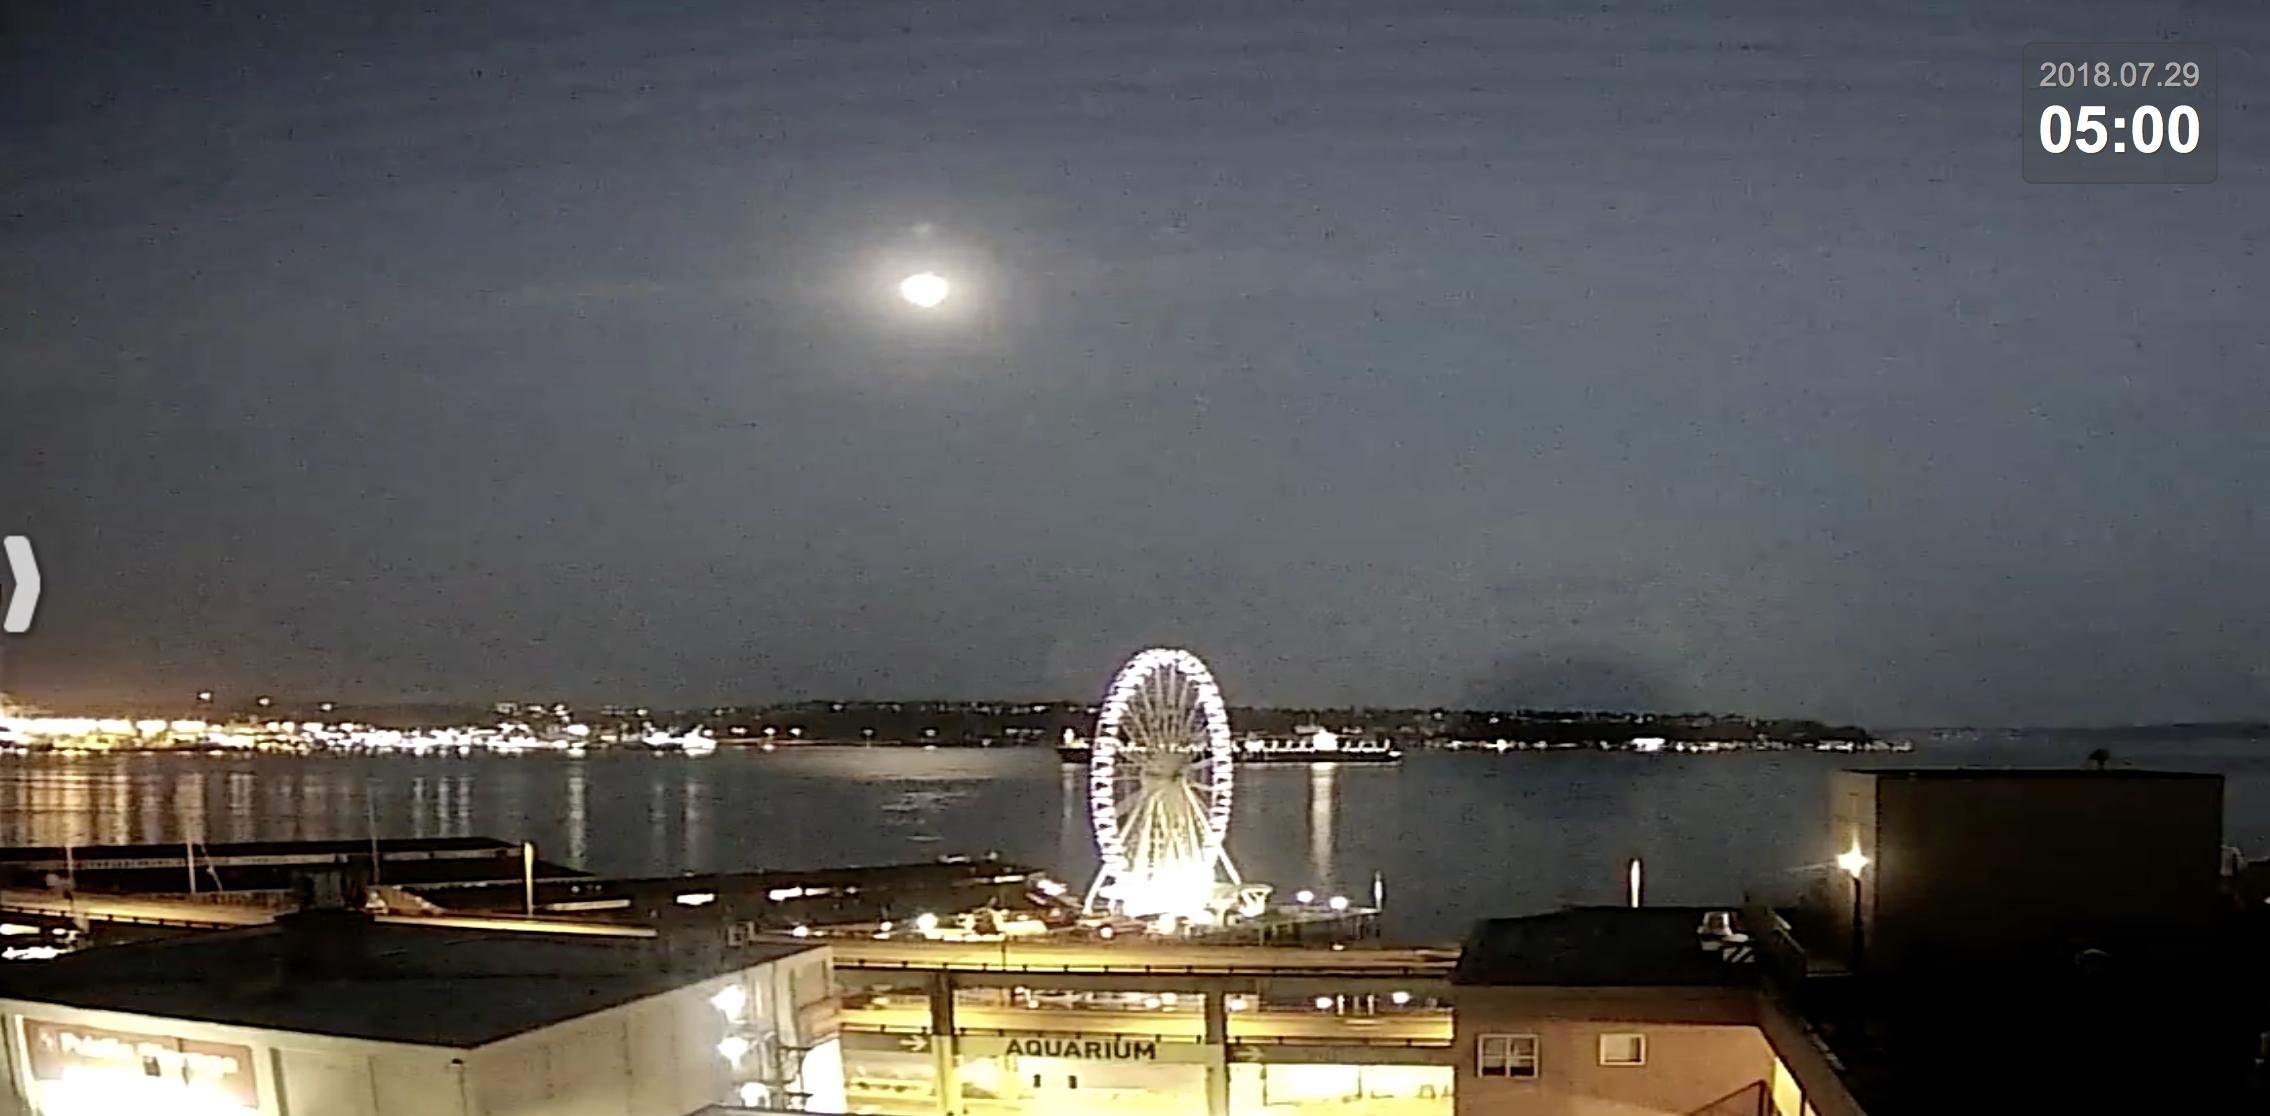 Seattle Waterfront Webcam 5 a.m. 07 30 2018